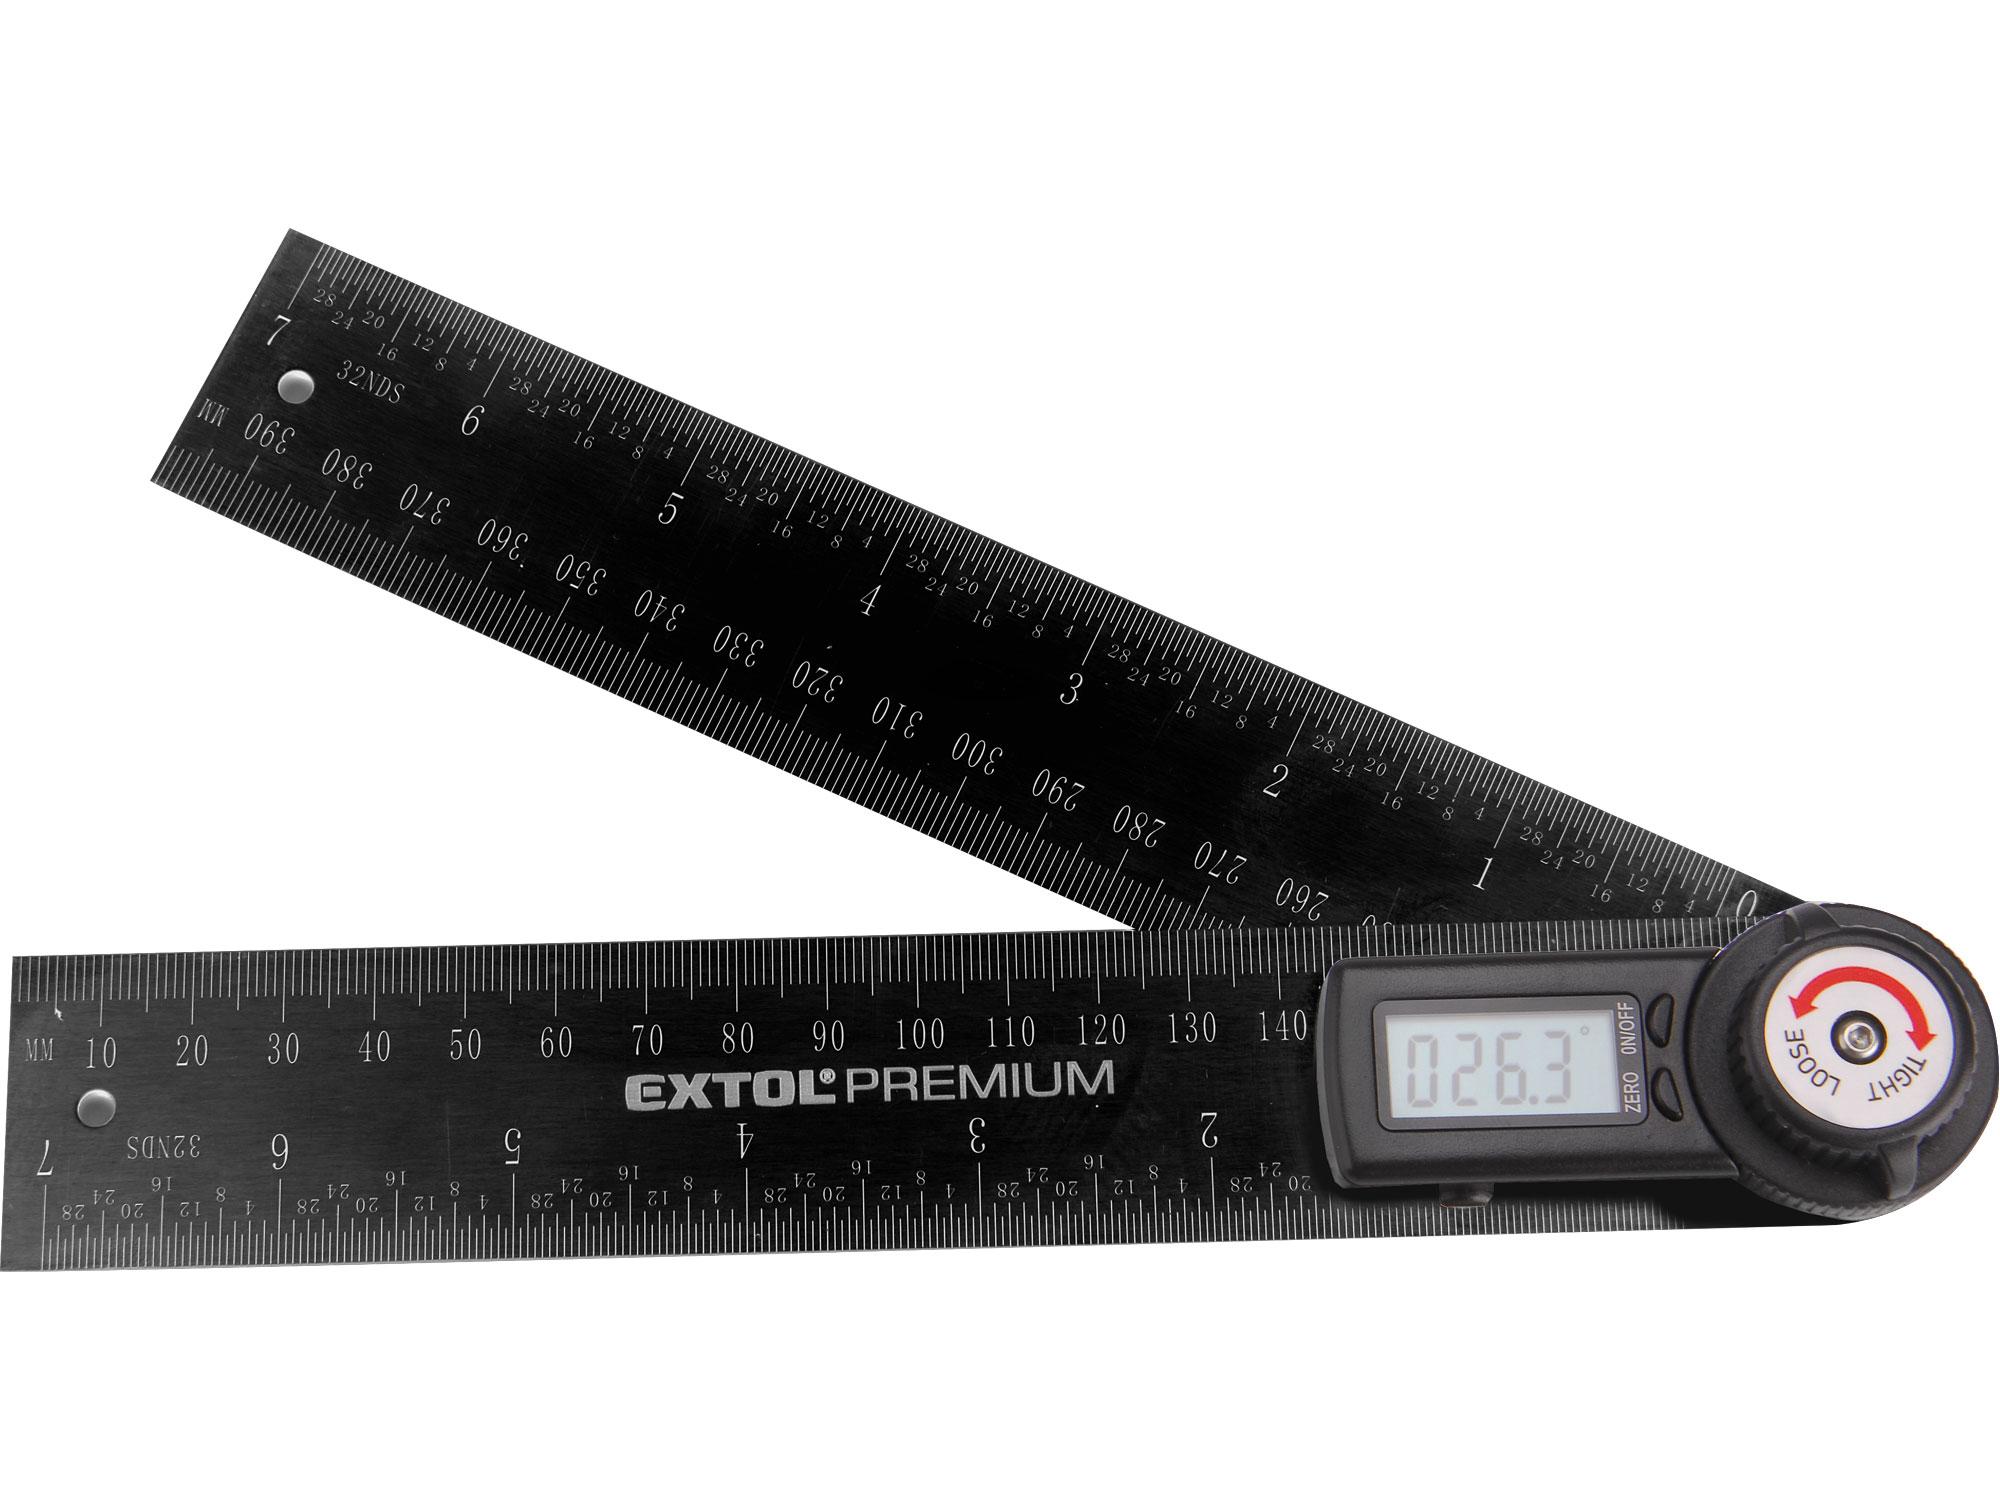 Digital Angle Rule, 200mm long